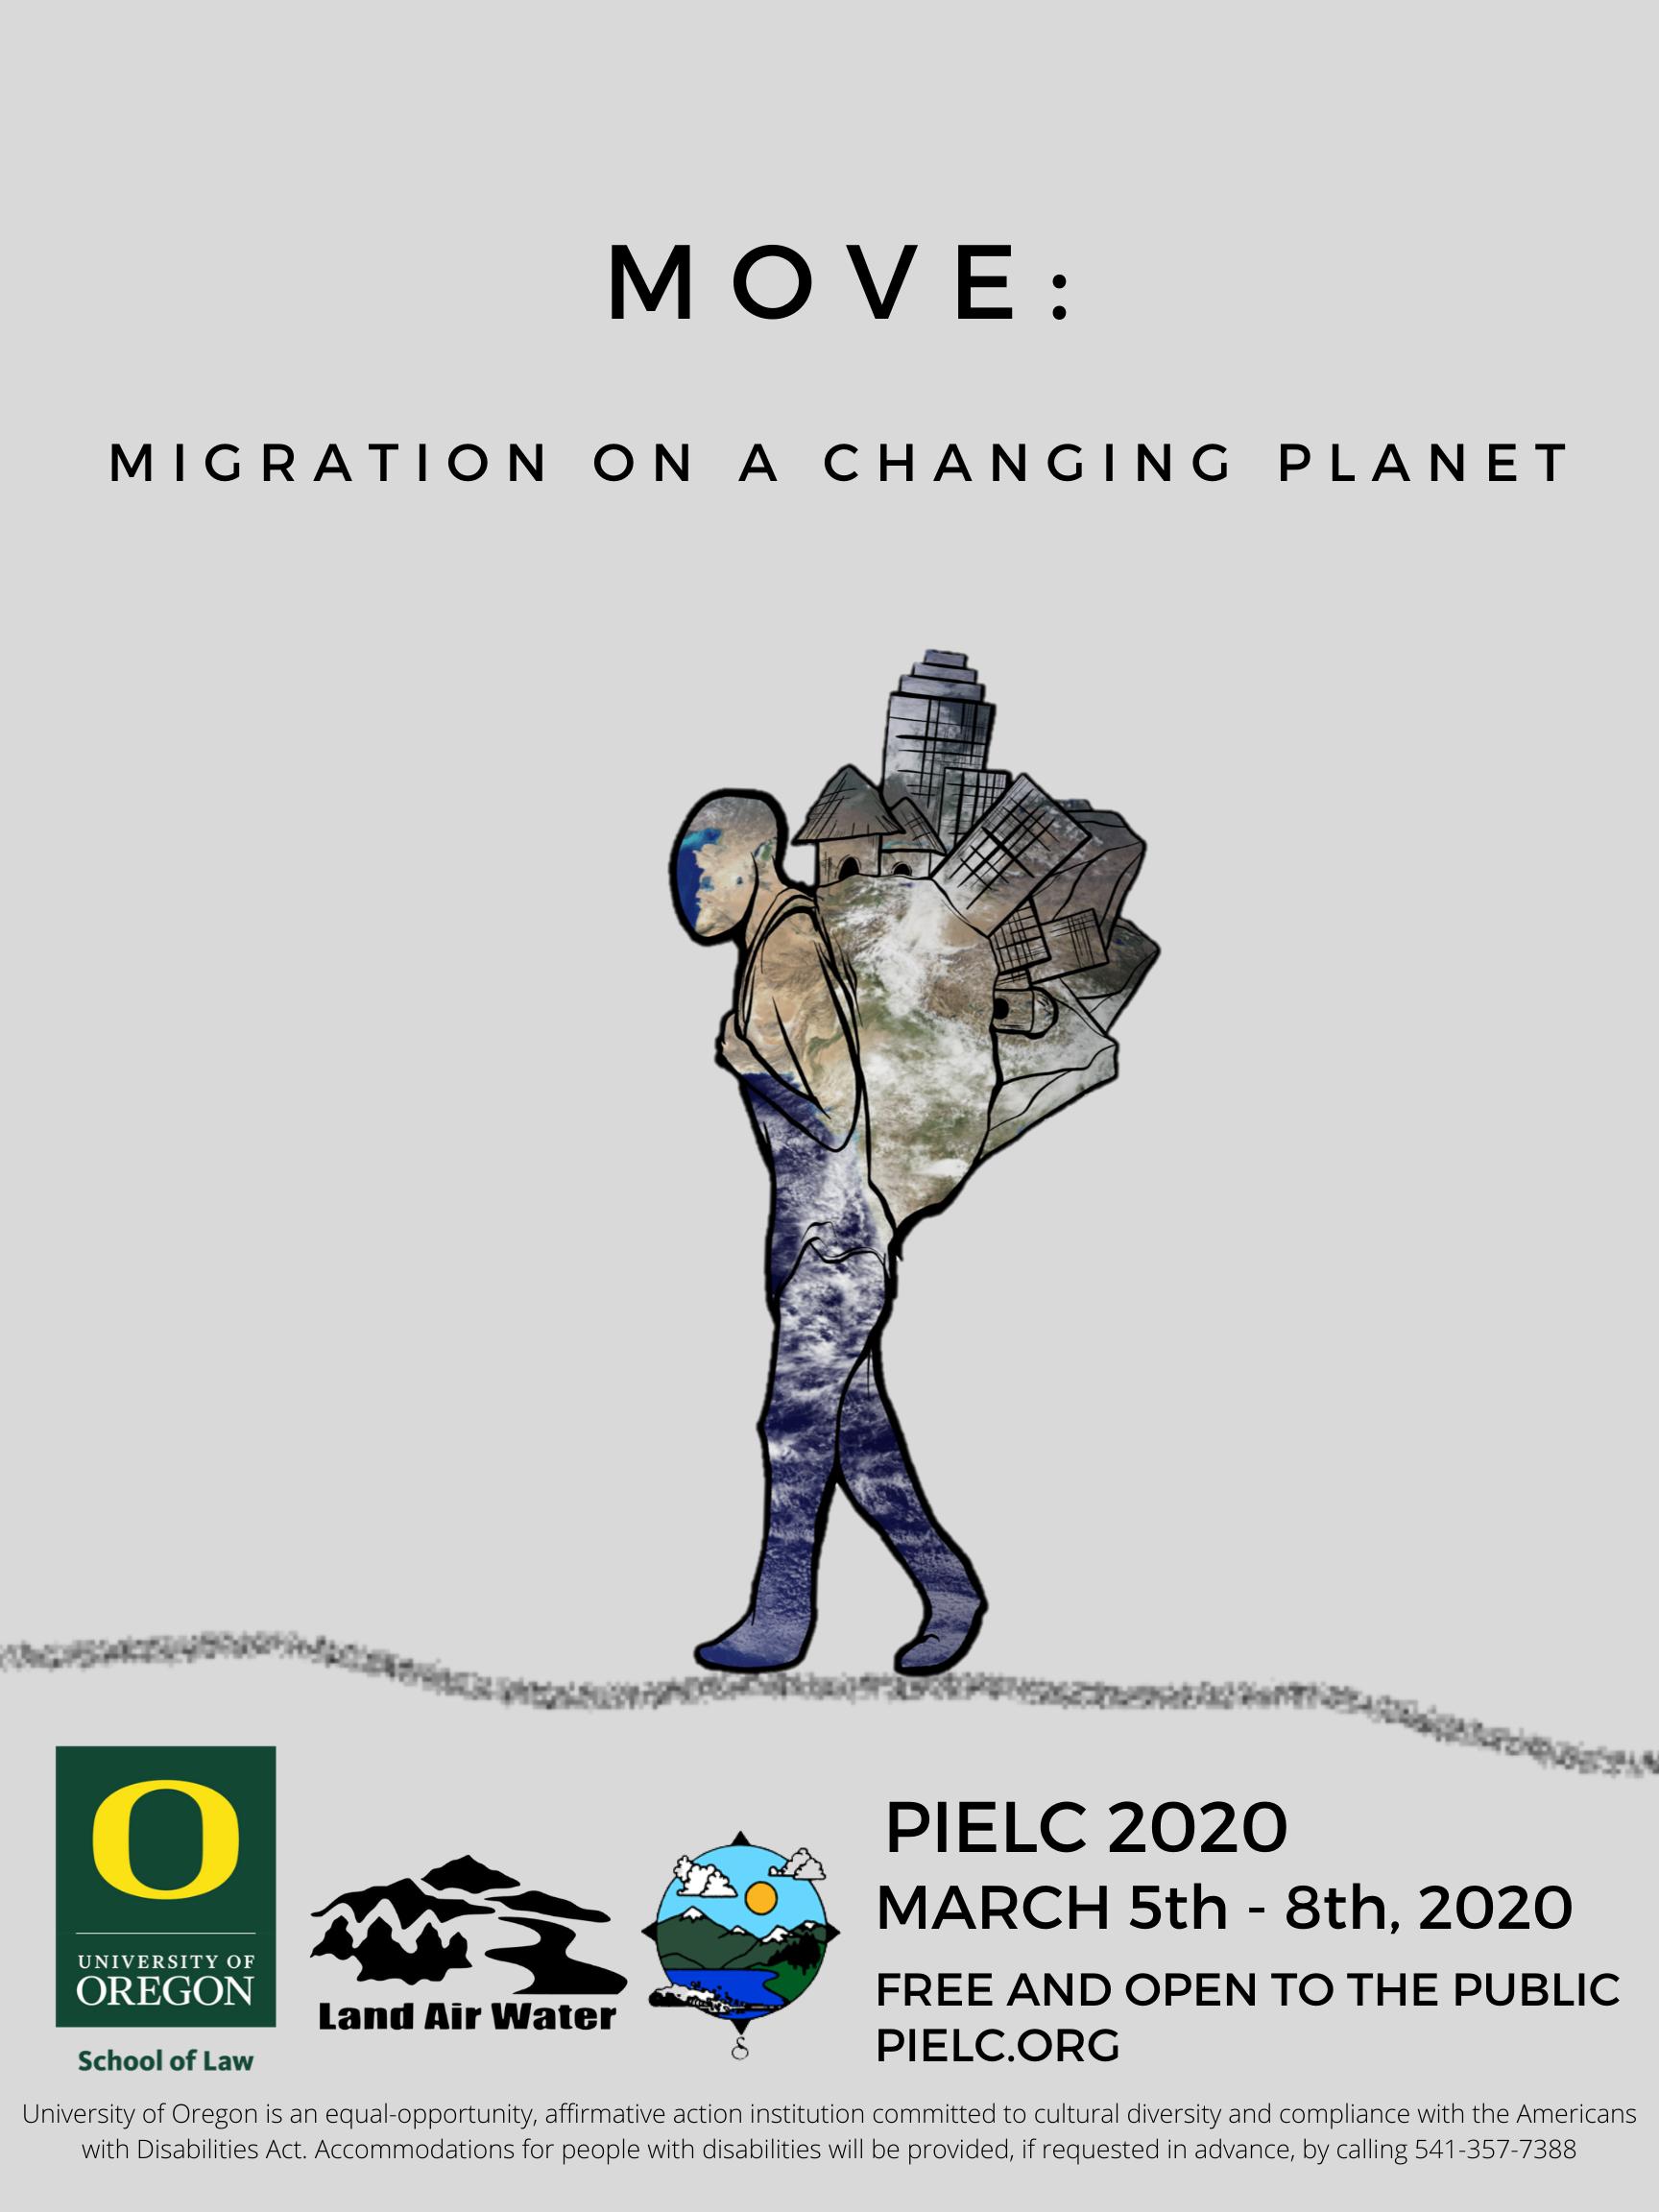 PIELC 2020 Poster